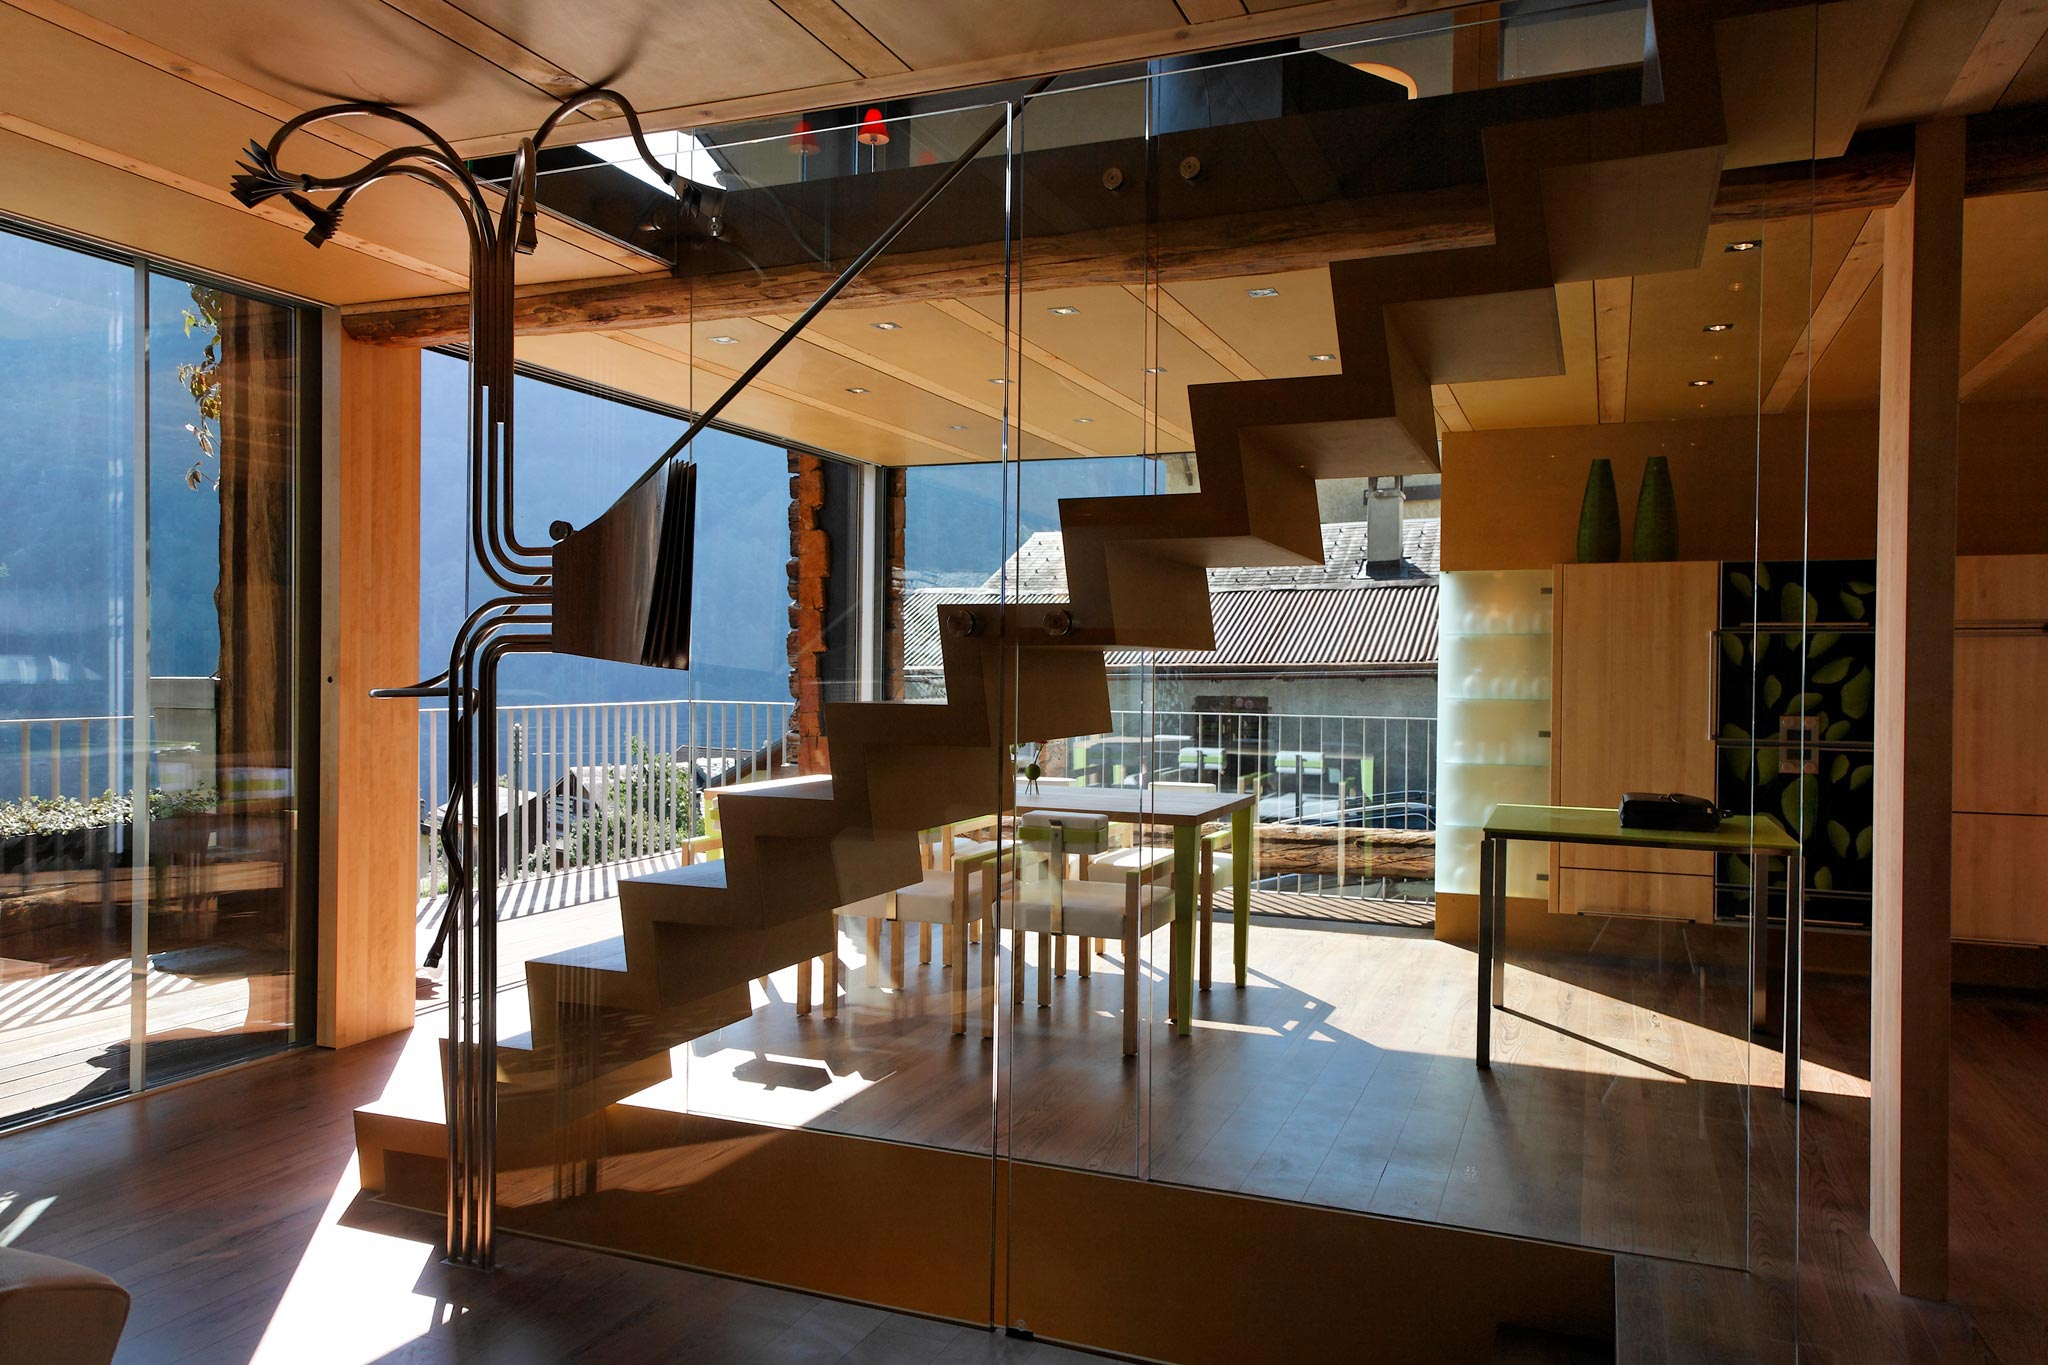 Es Gd Raccard 678 escalierRez hor 20 05 006 - L'escalier du Grand Raccard